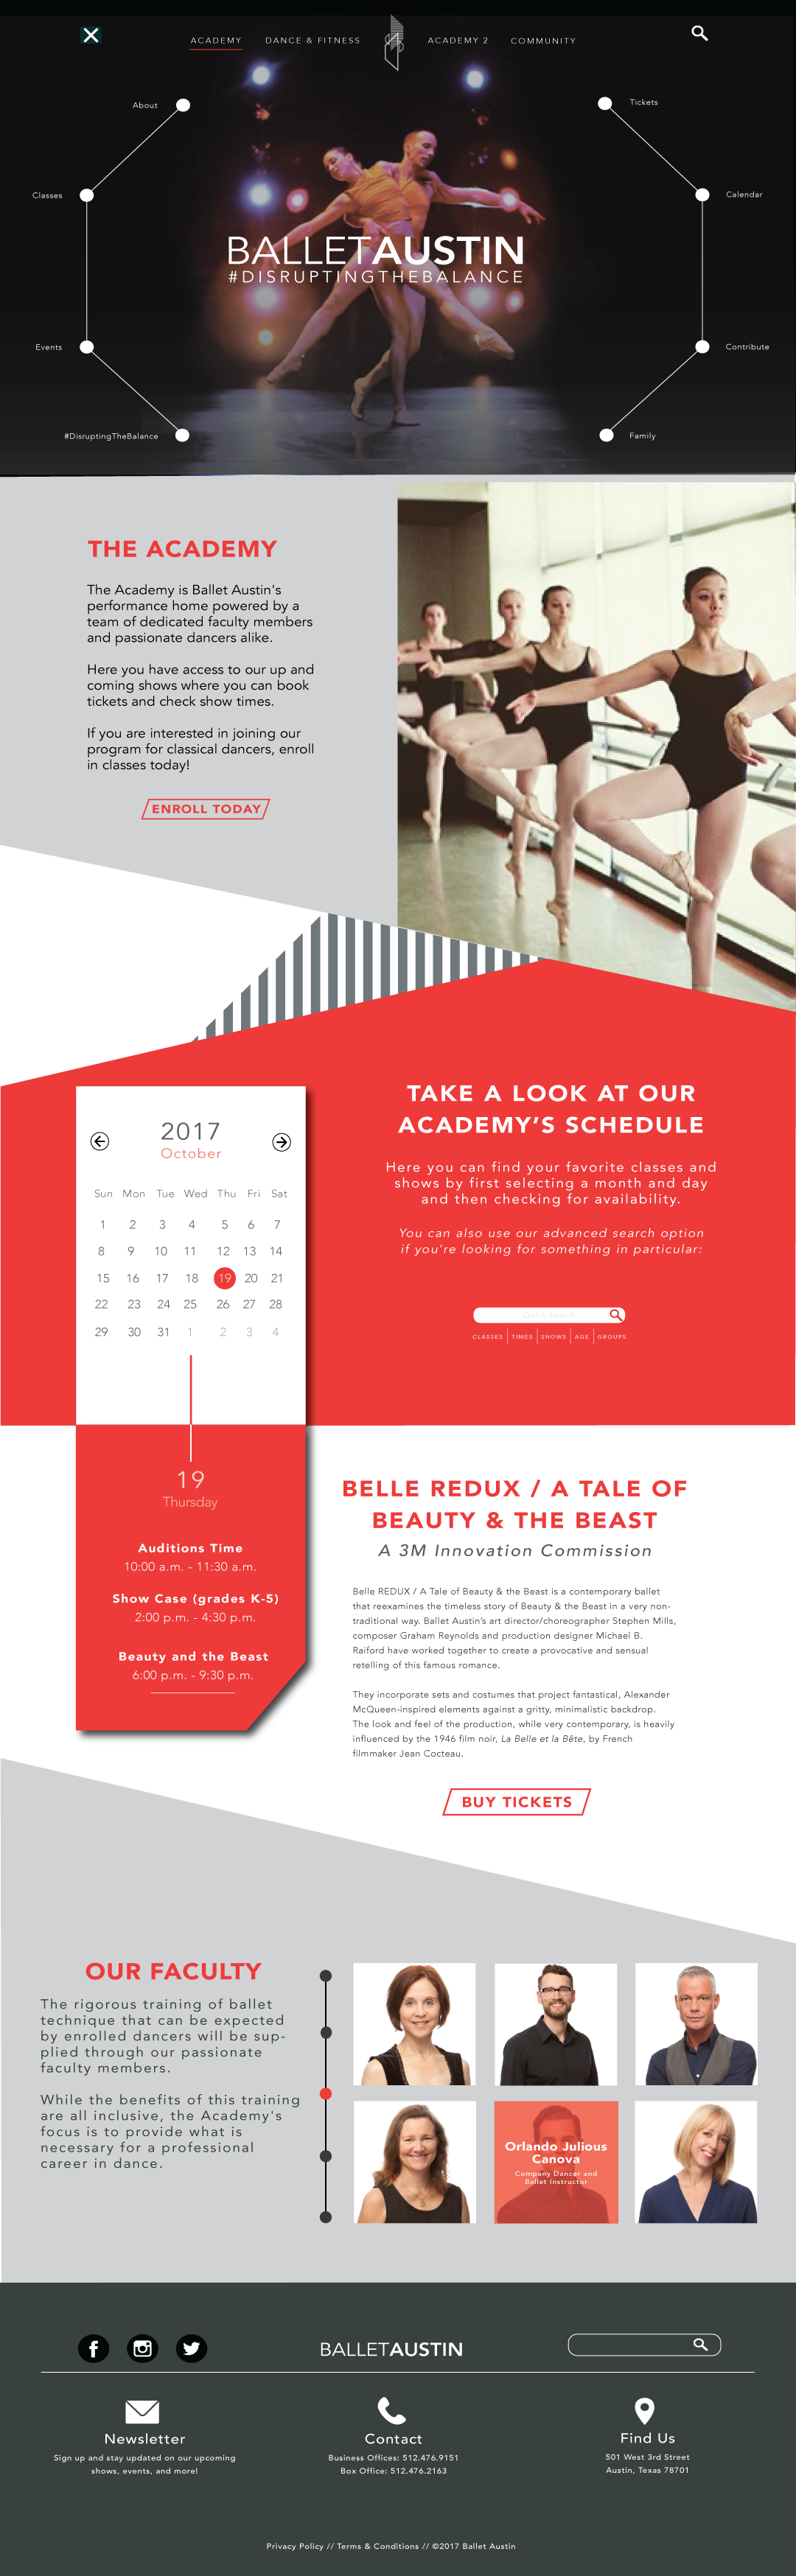 Final-Academy-web-(2).png